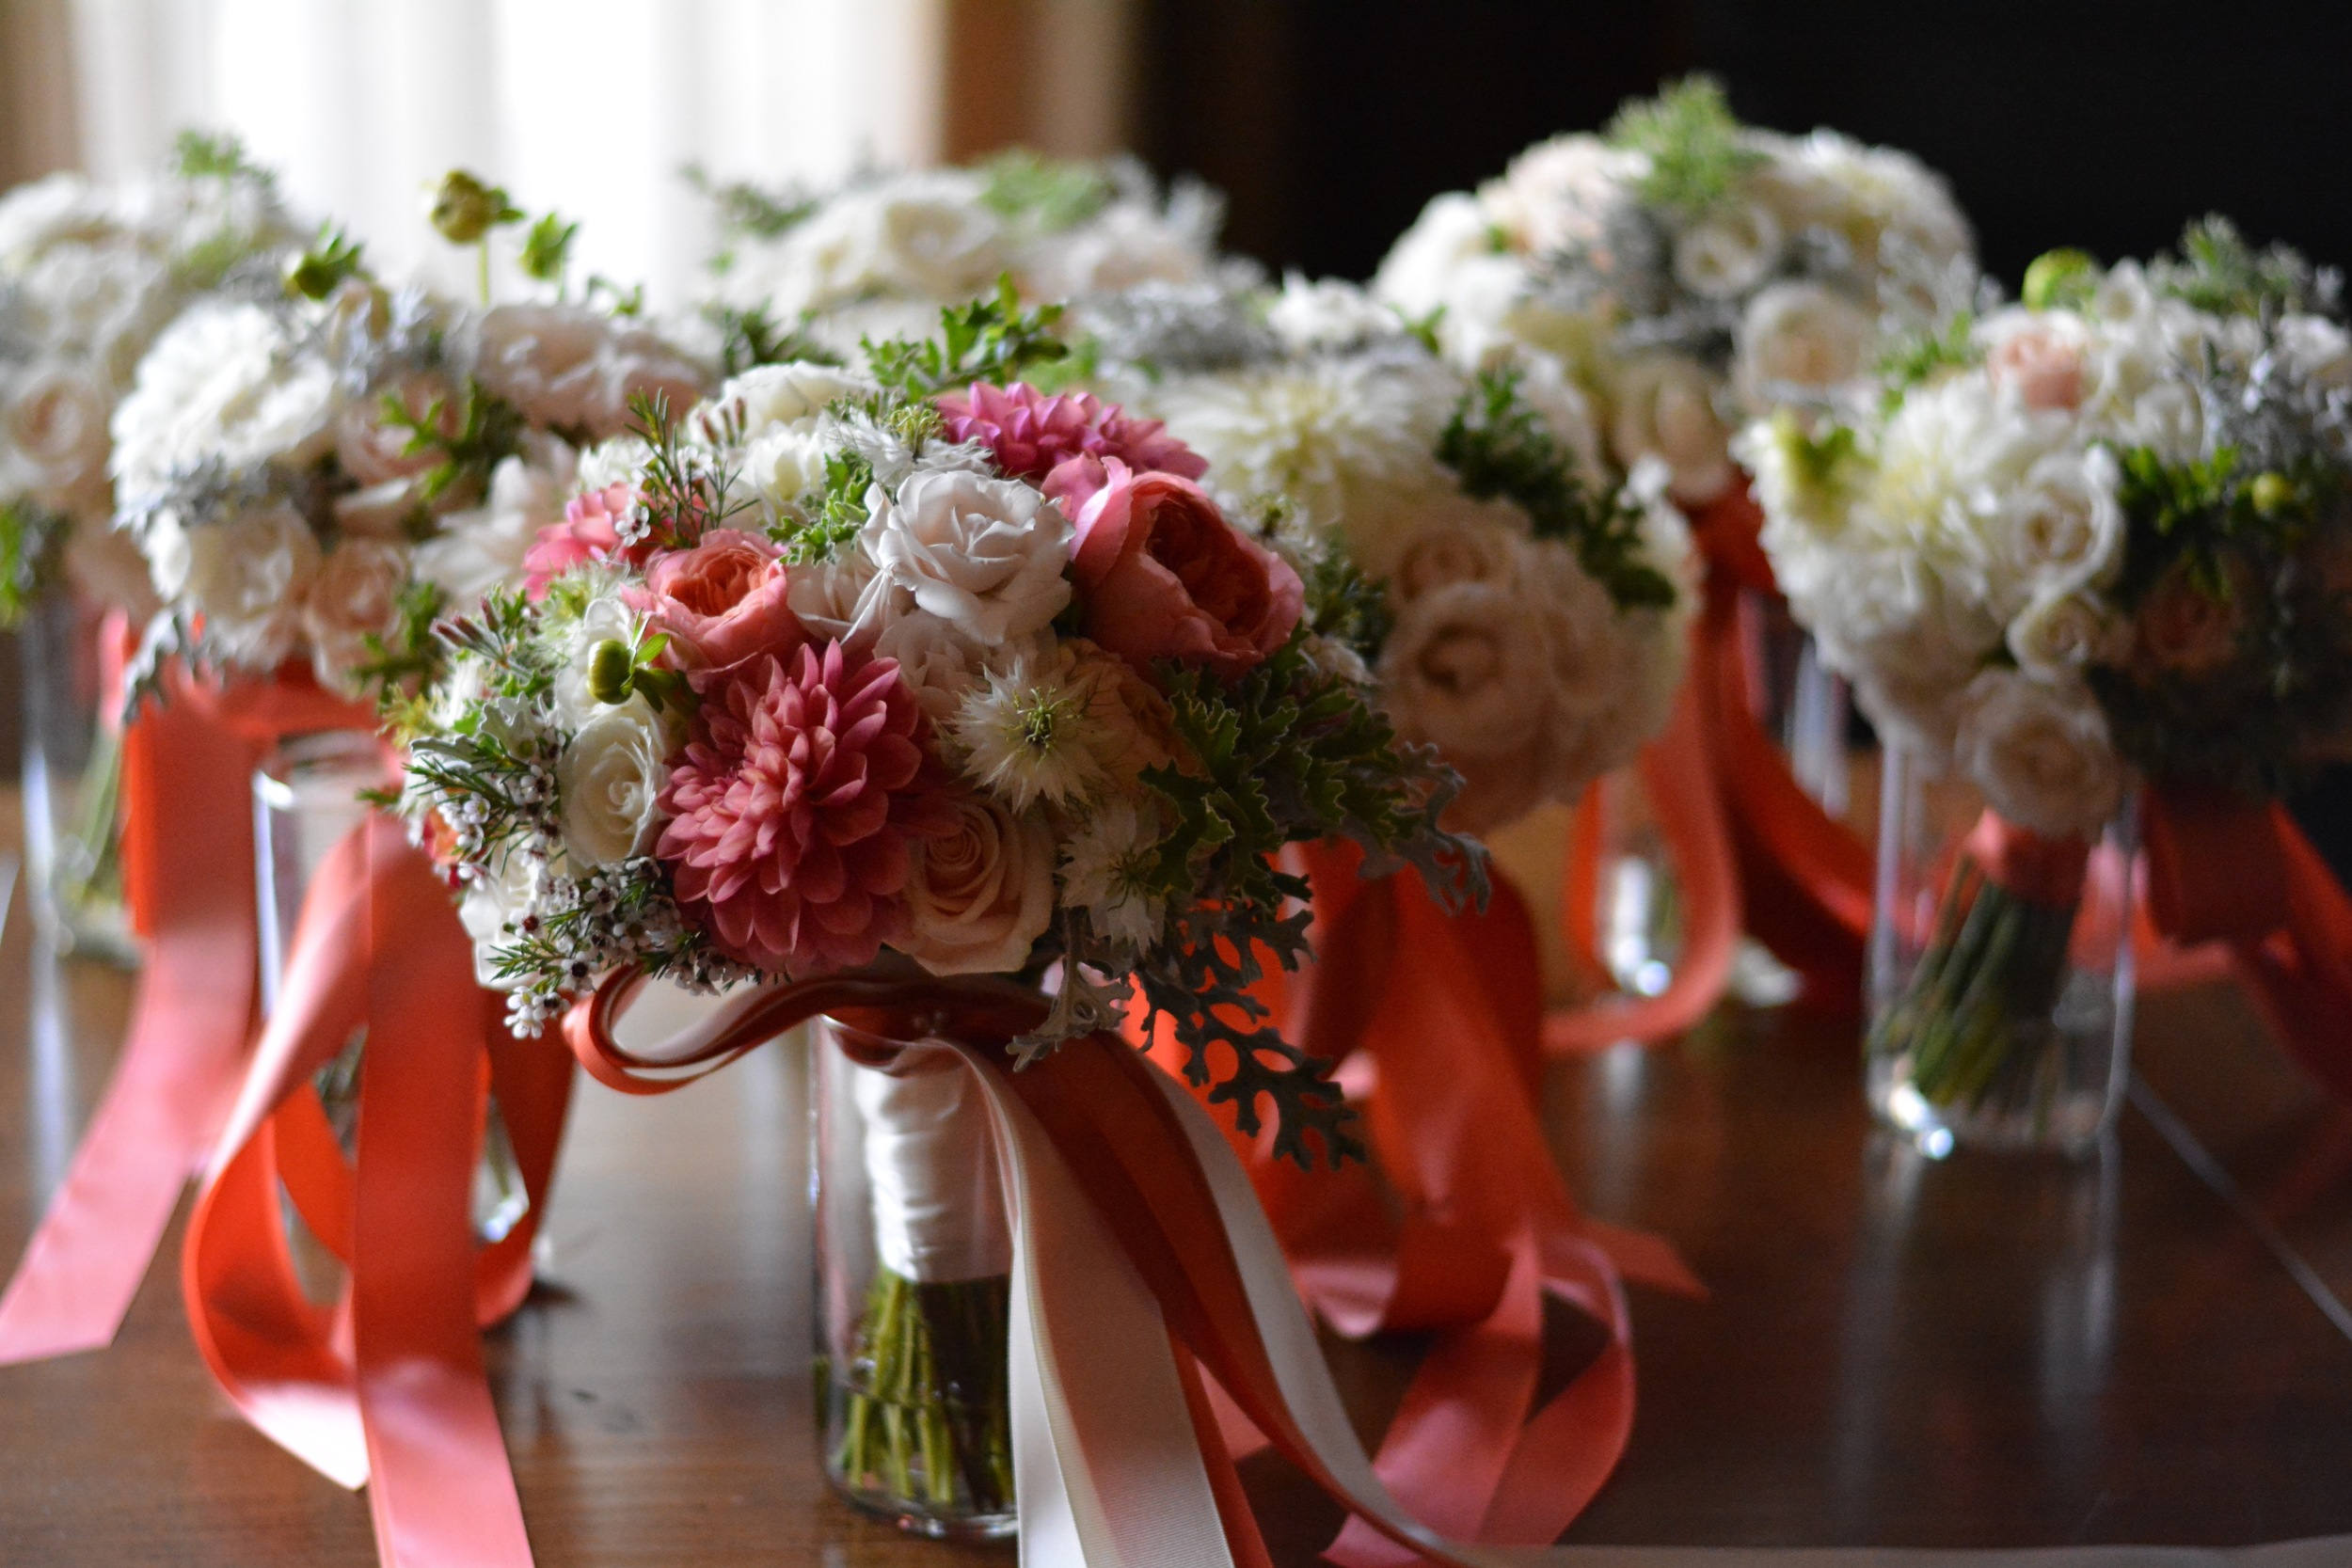 Heirloom Floral Design - Bend Weddings - Flowers to Hold pronghorn resort- locally grown -farmer florist .jpg